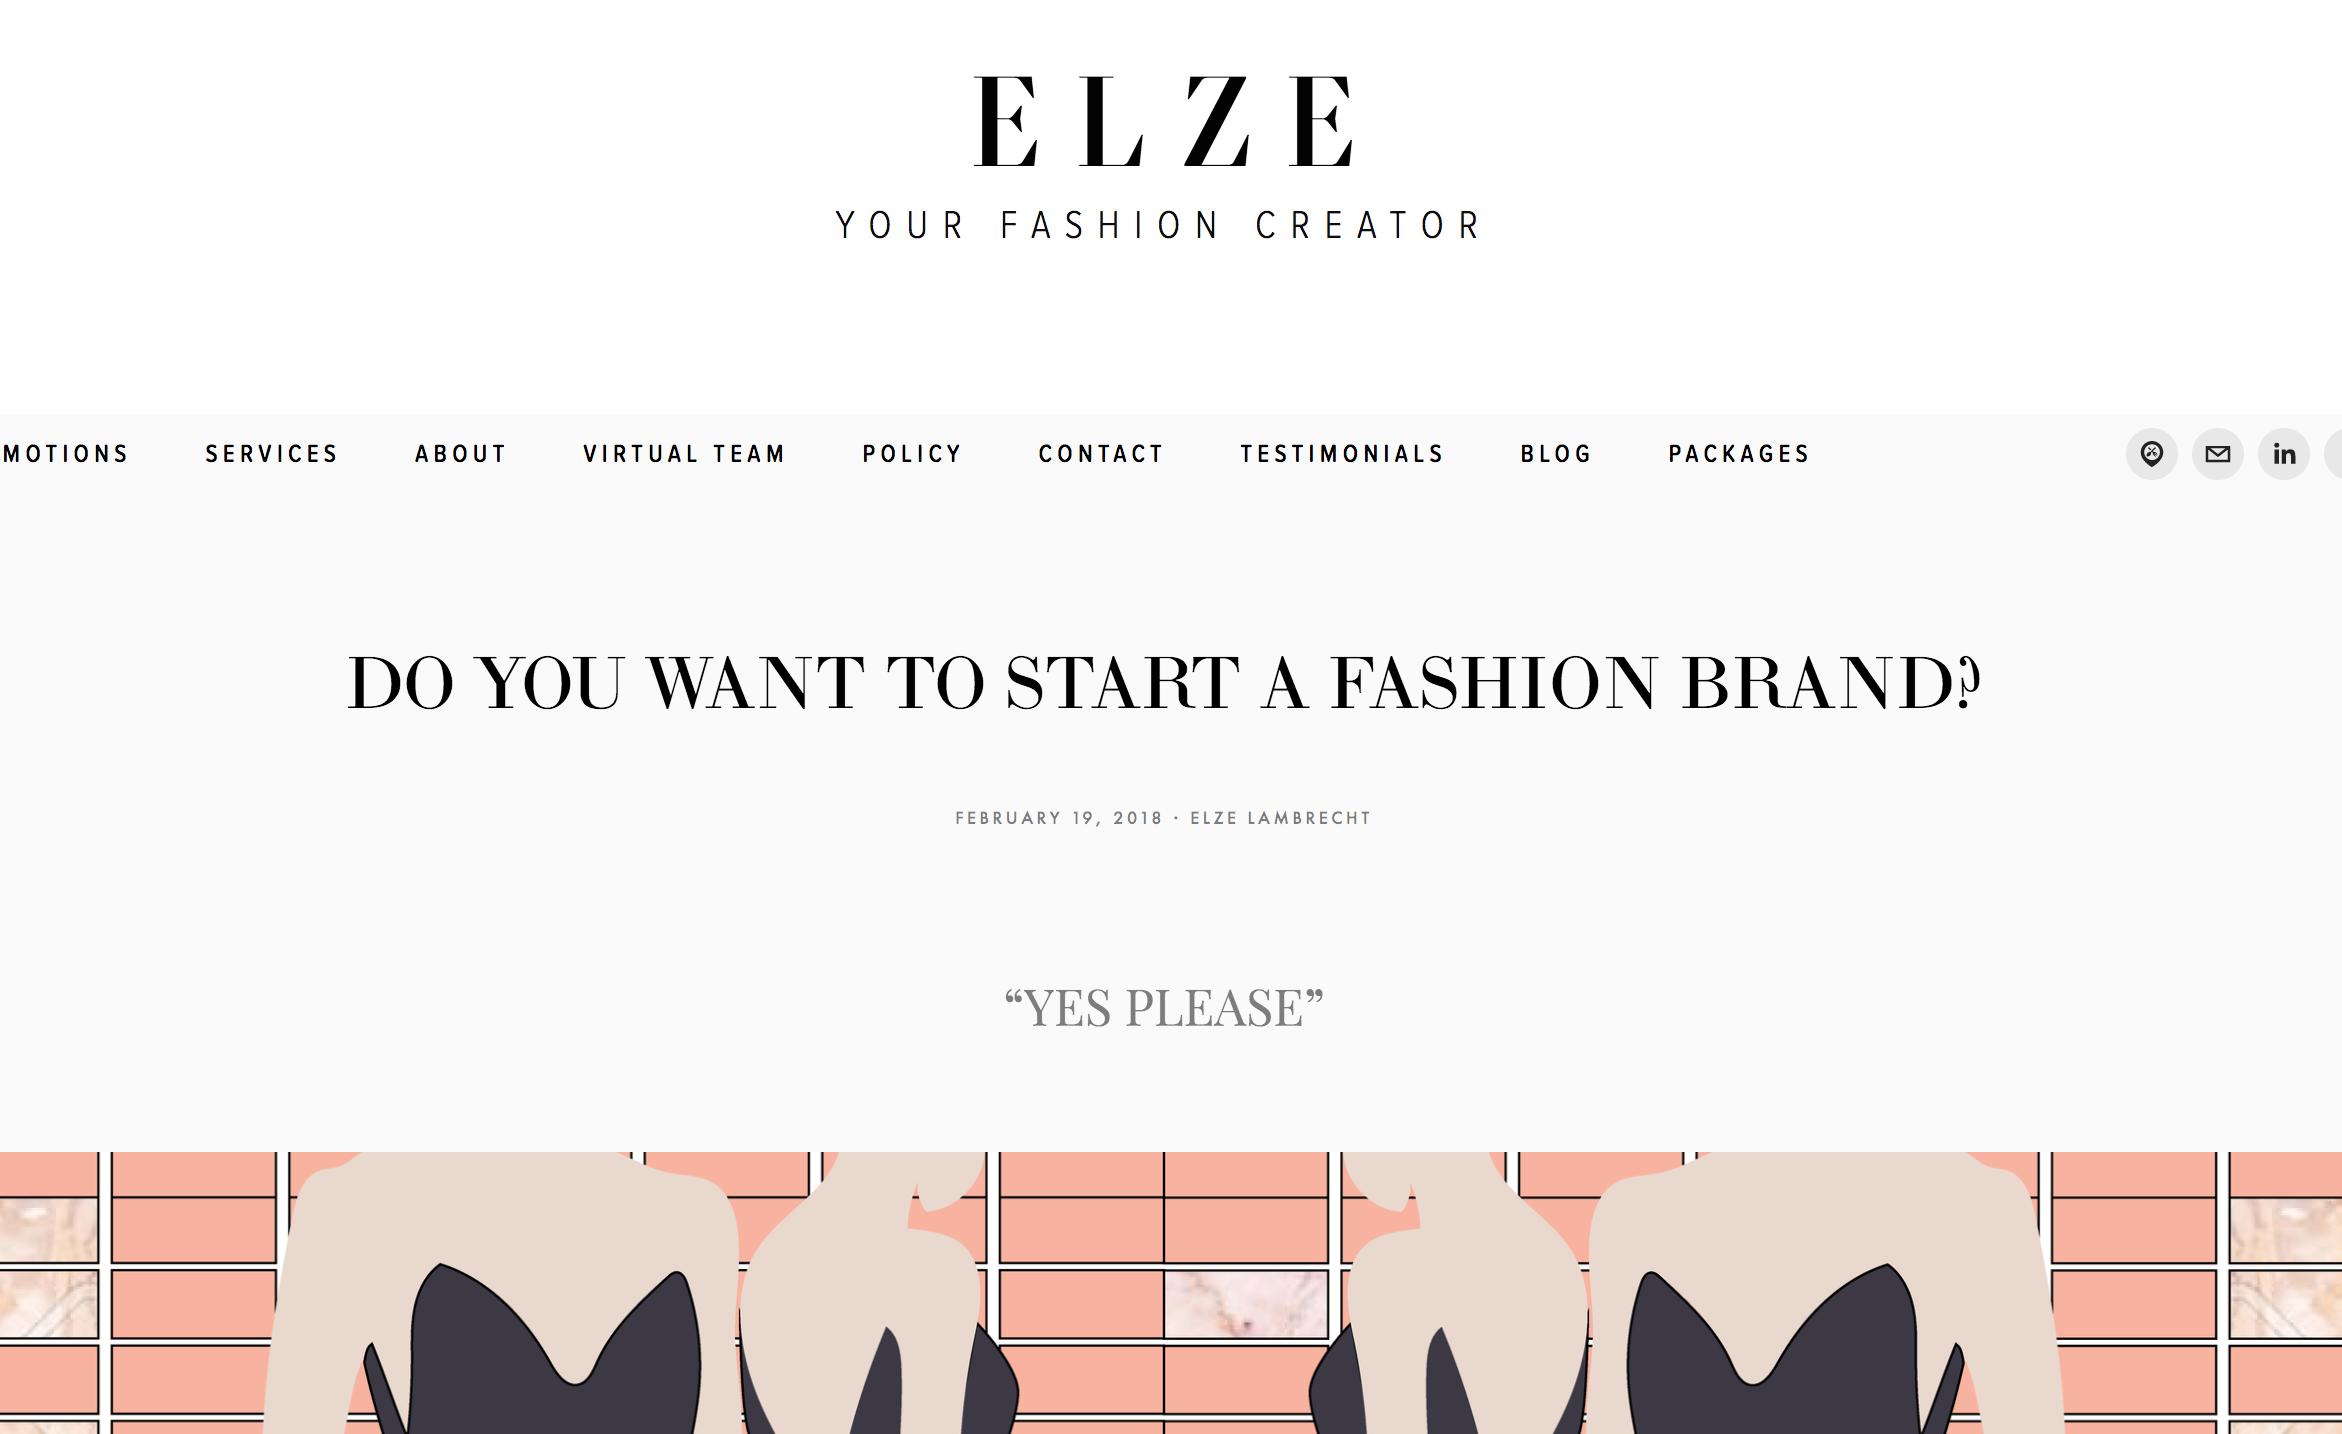 FASHION COACHING BLOG E L Z E creation blog fashion creative